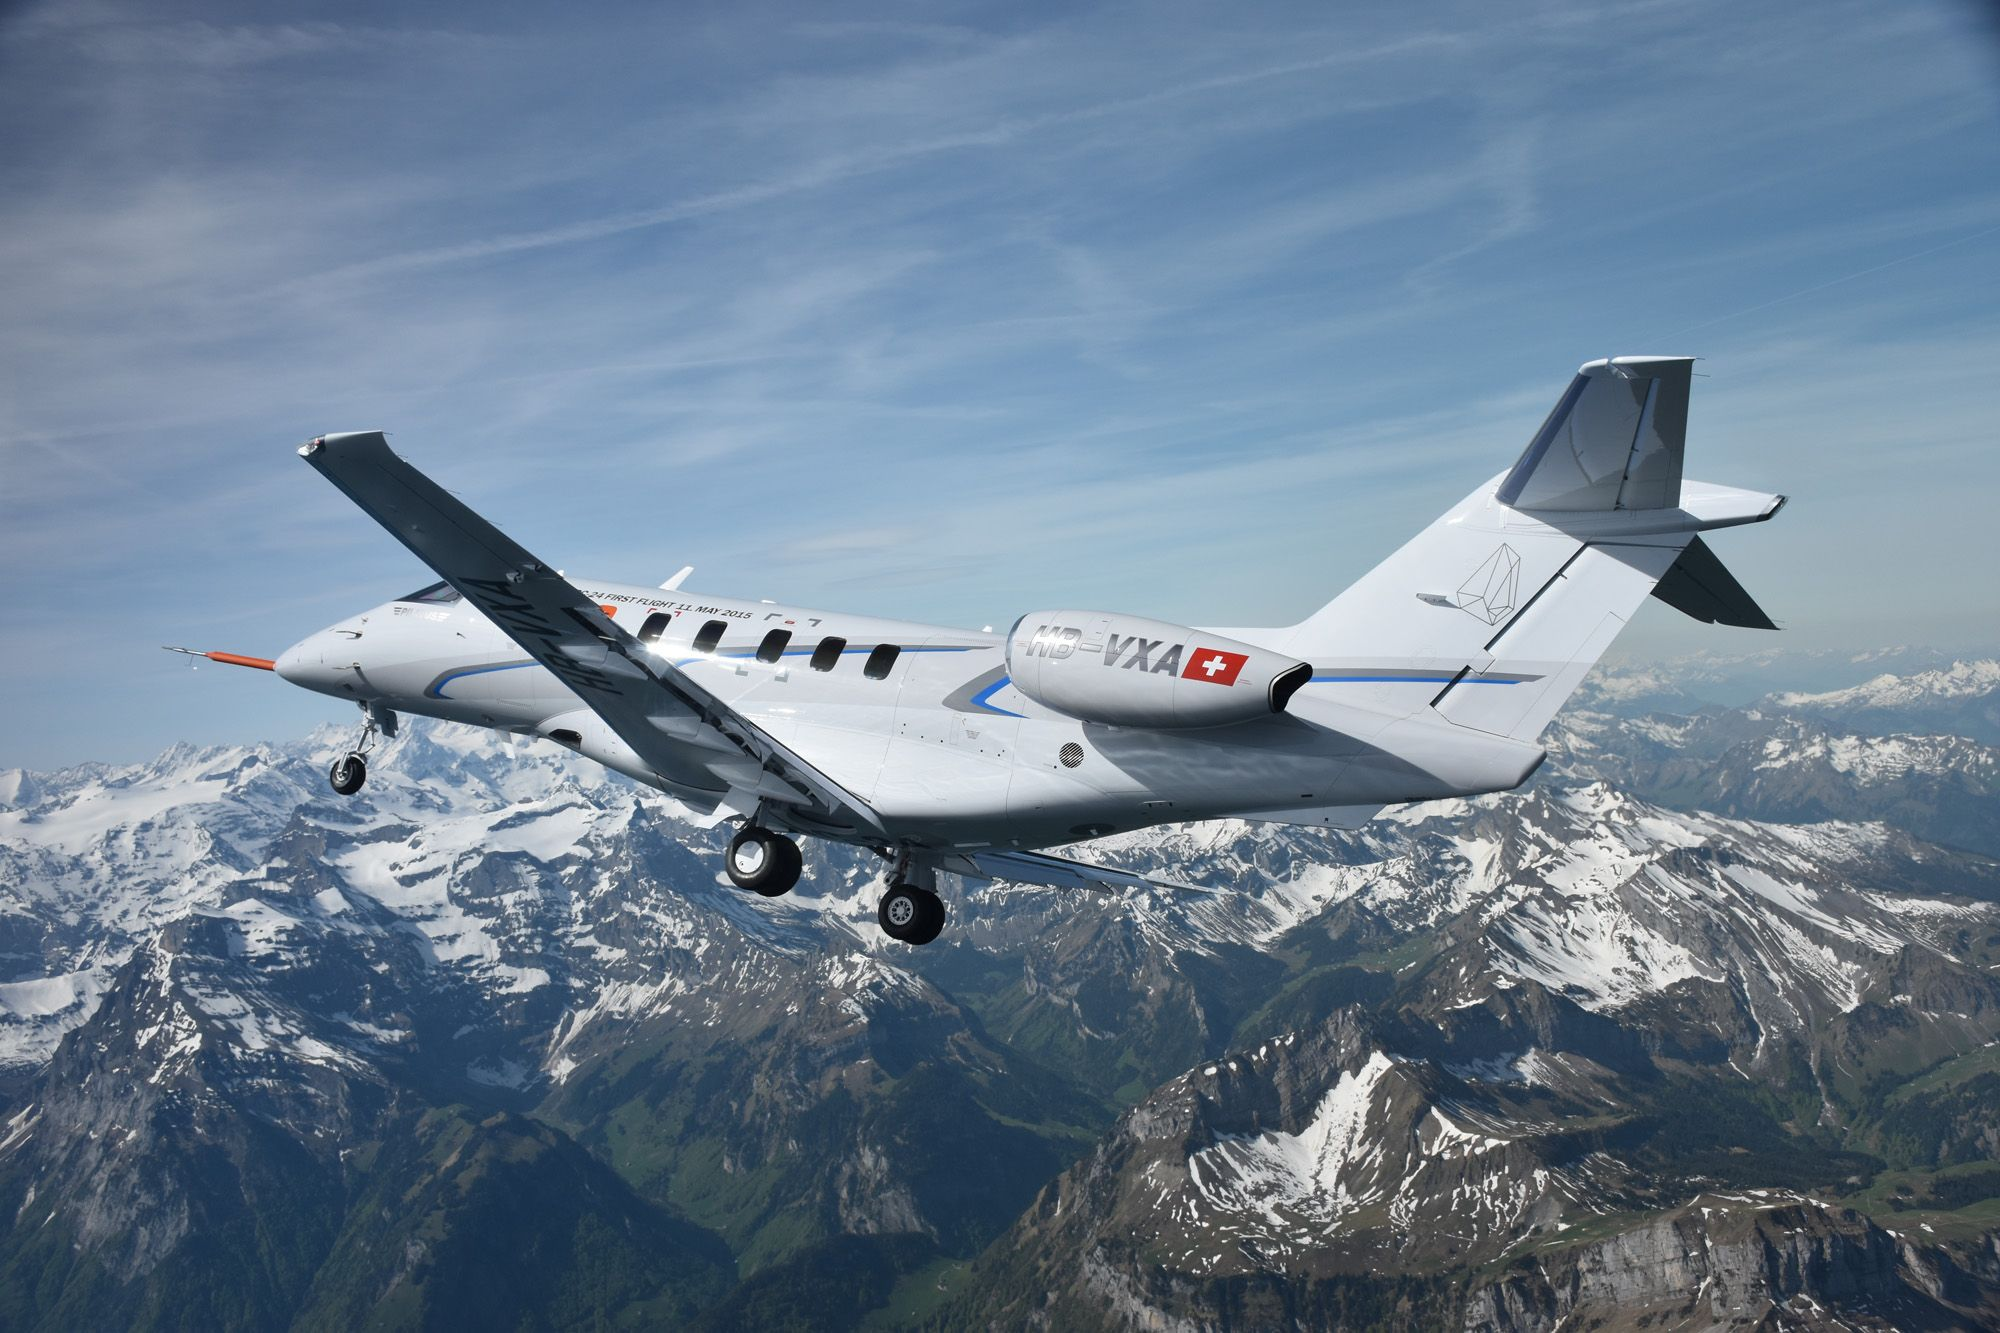 Pilatus Aircraft,PC-24 Super Versatile Jet